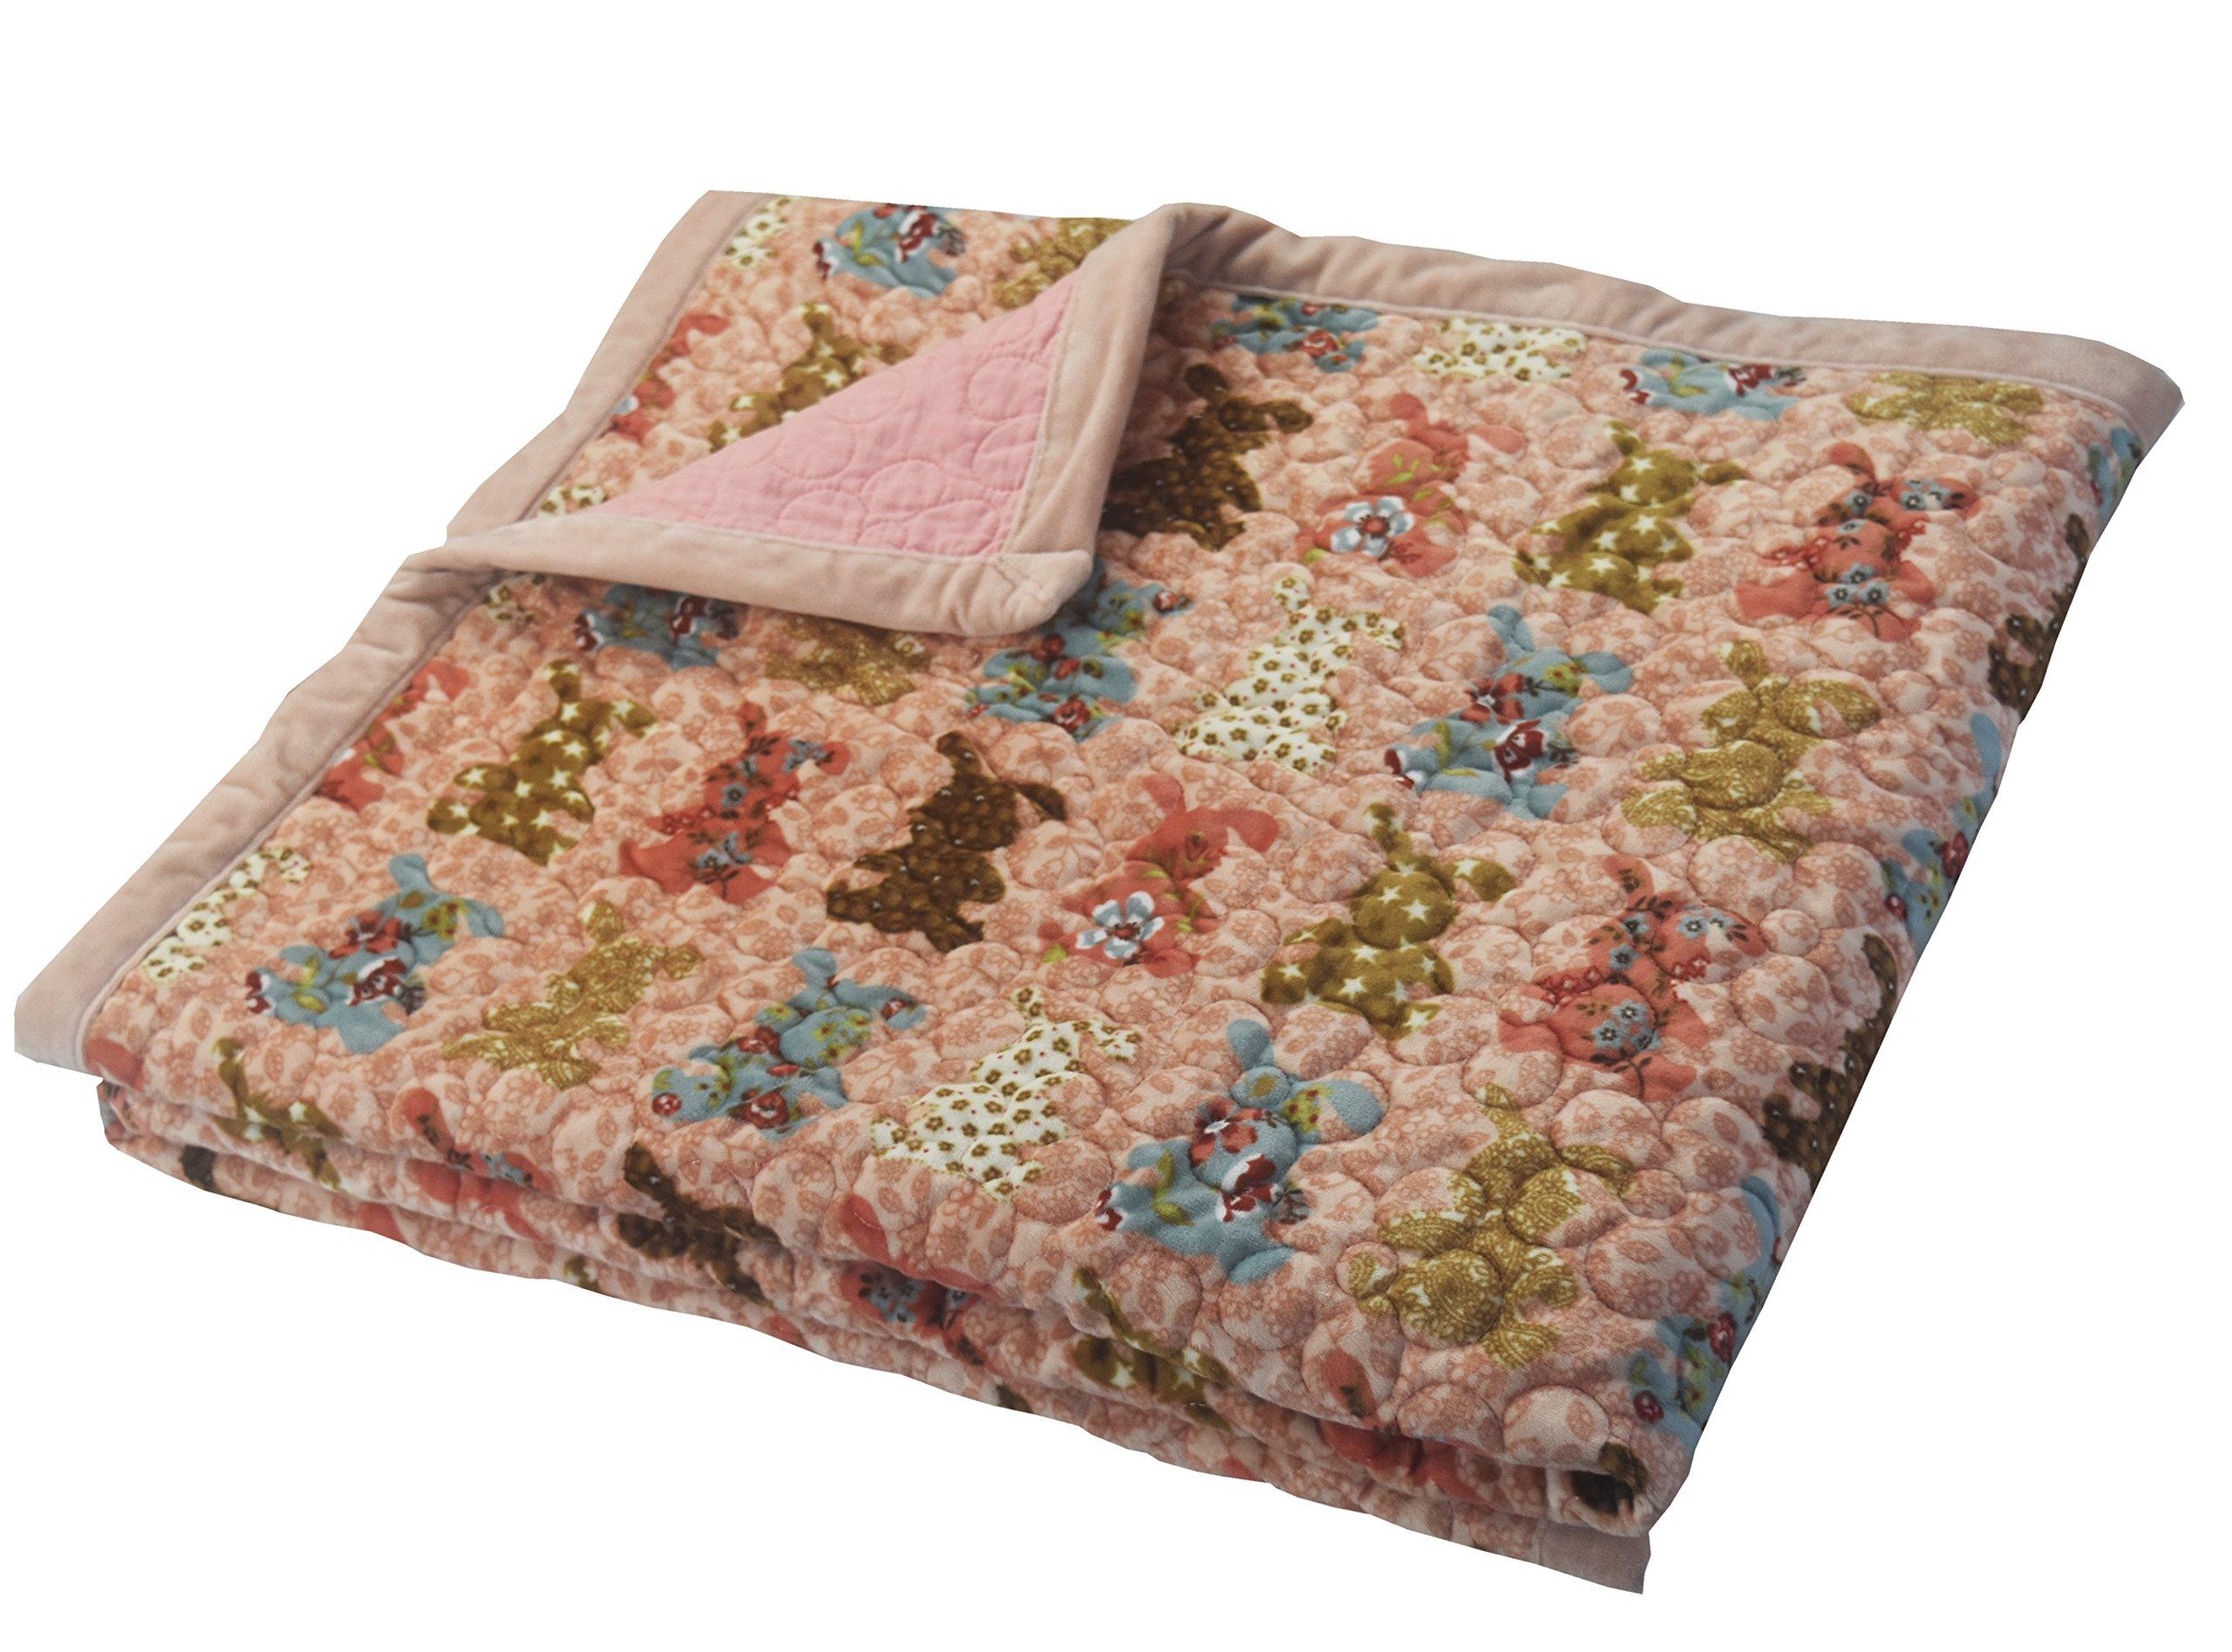 J-pinno Pink Rabbit Reversible Bedding Coverlet Quilt Bedspread Throw Blanket for Kid's Boy Girl Bed Gift, Soft Short Plush Velvet + Washed Cotton (Toddler 47'' X 59'', rabbitP)